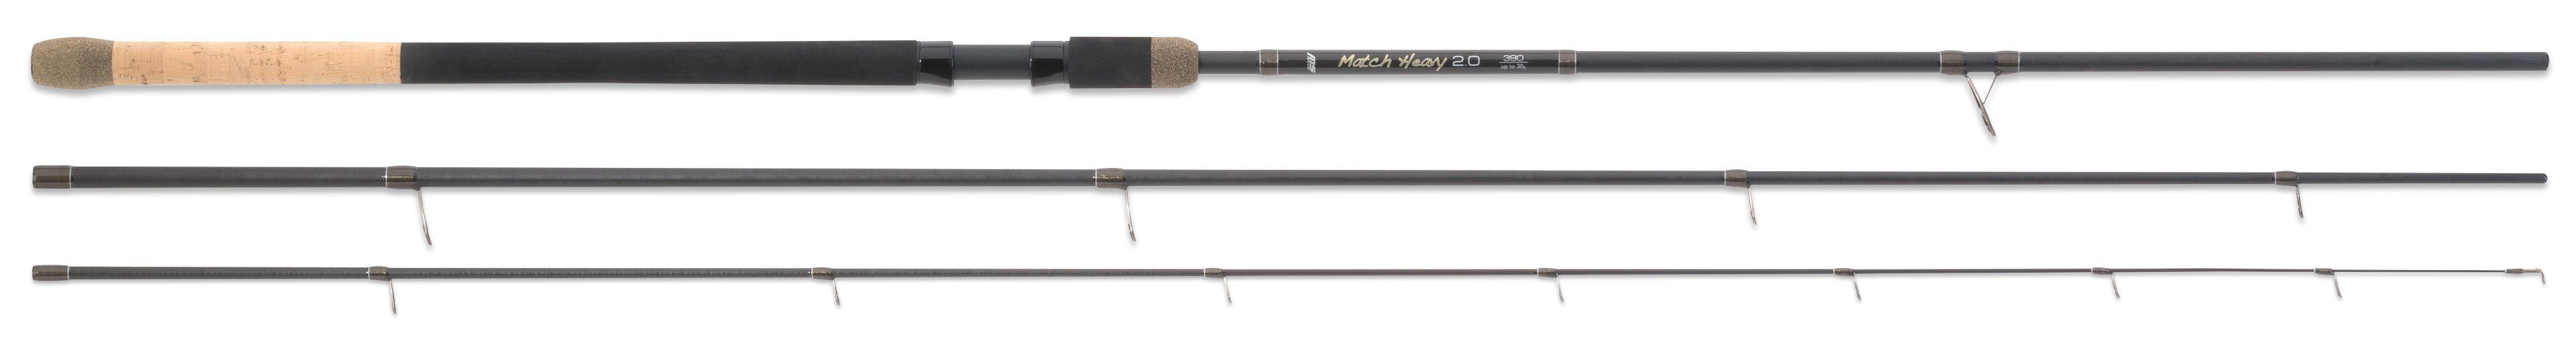 MS Range prut Match Heavy 2.0, 3,9 m, 30 g